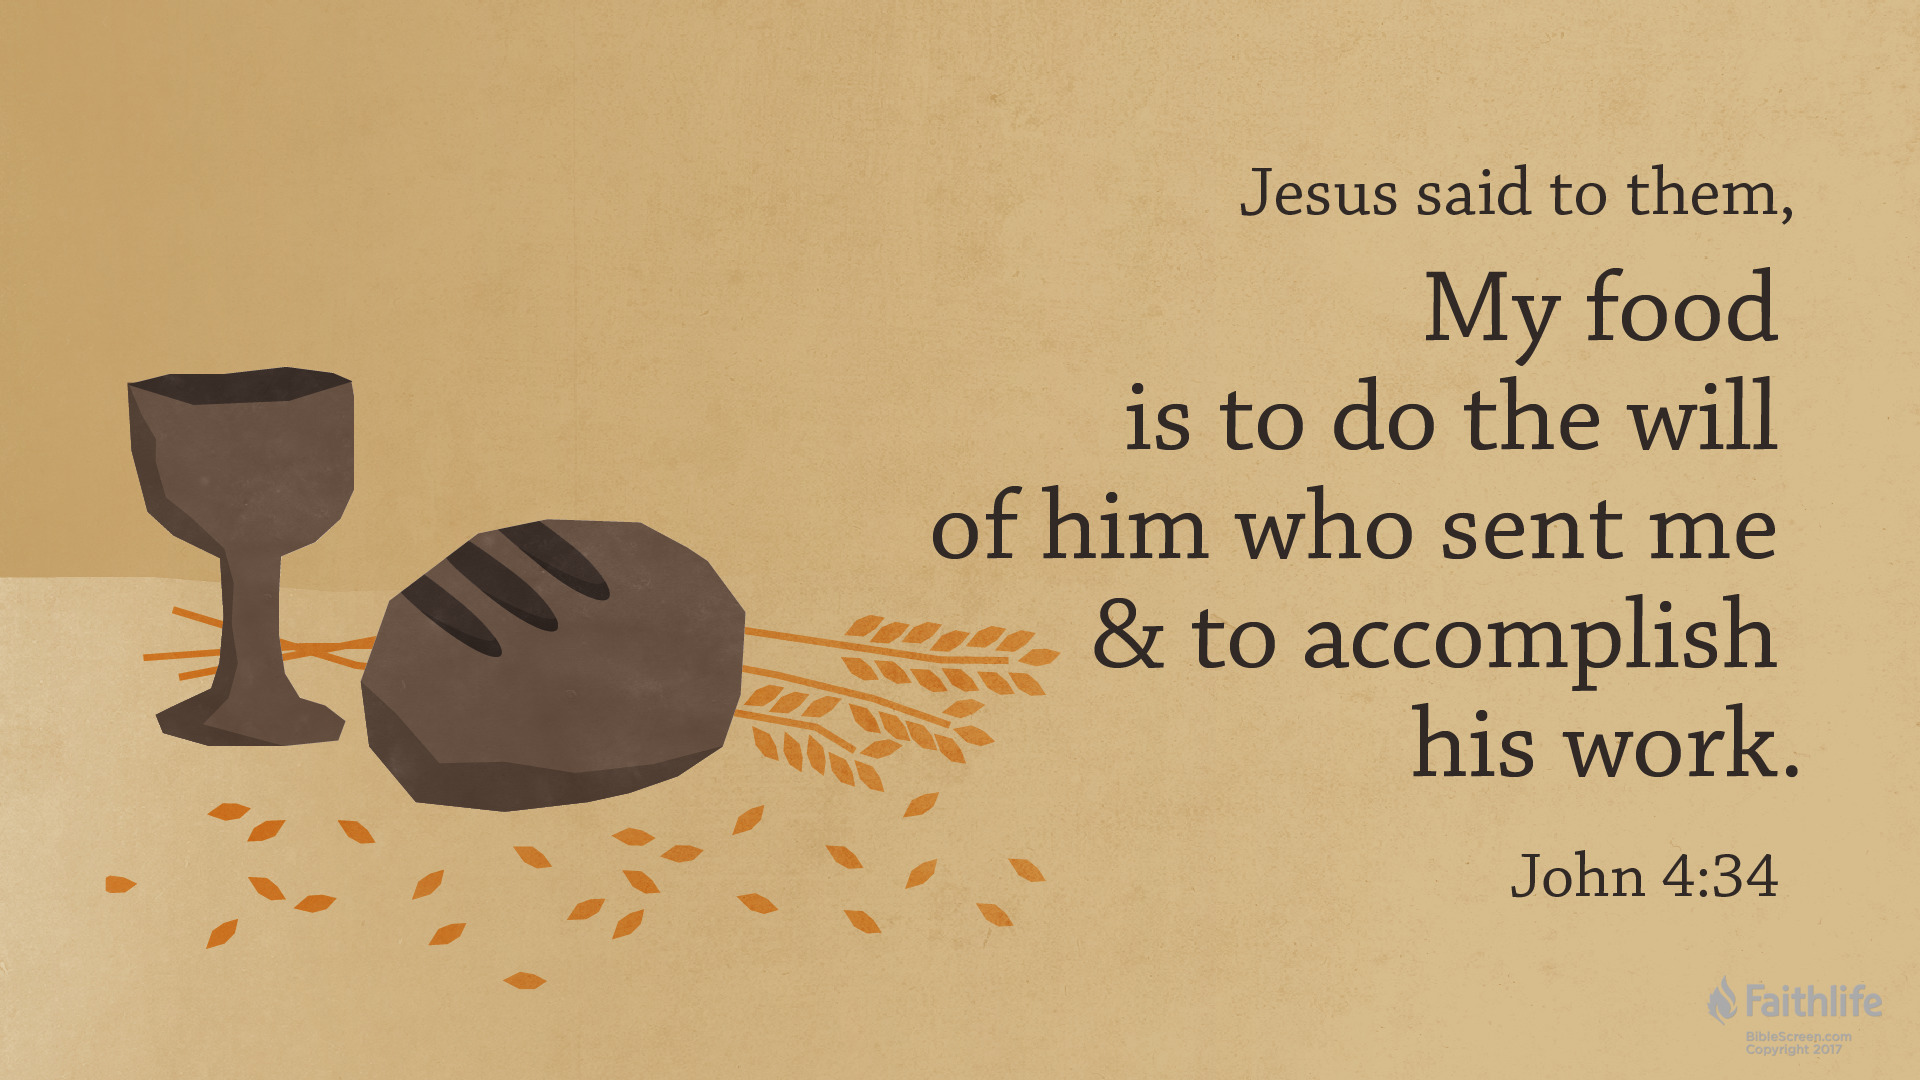 Image source: https://biblia.com/bible/esv/John%204.34